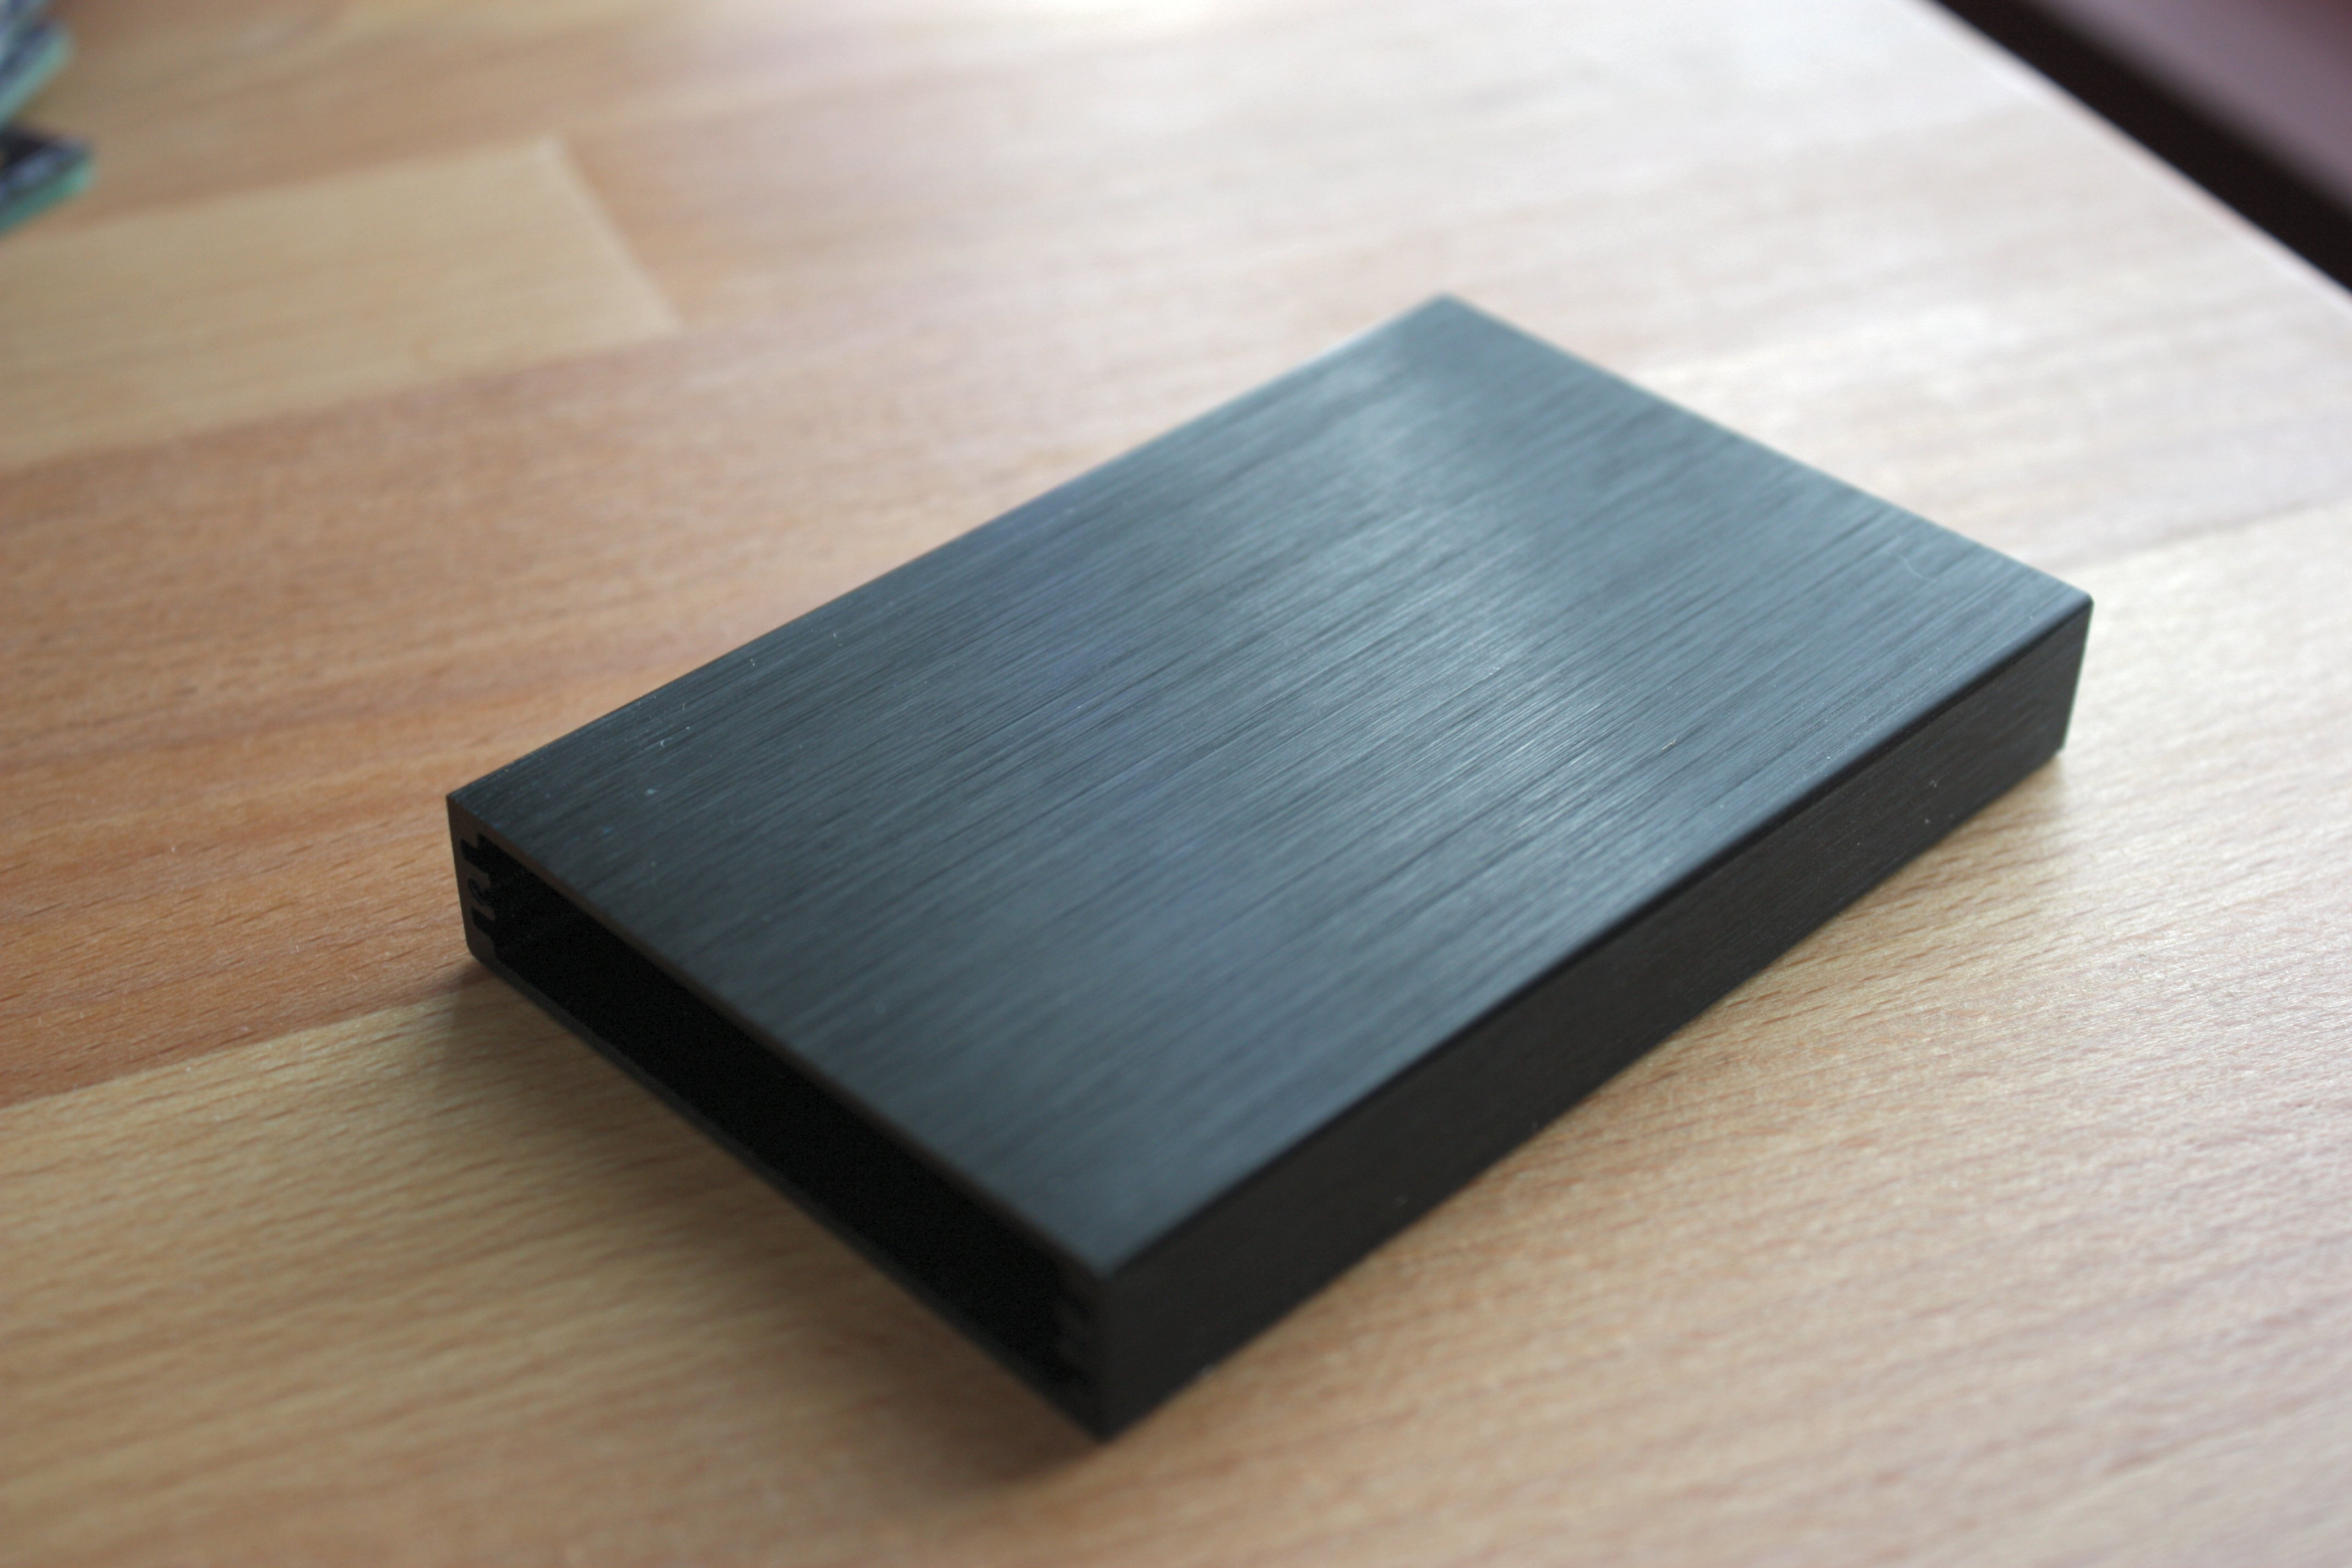 Diy black anodizing aluminum poemsrom brushed anodized aluminum solutioingenieria Image collections